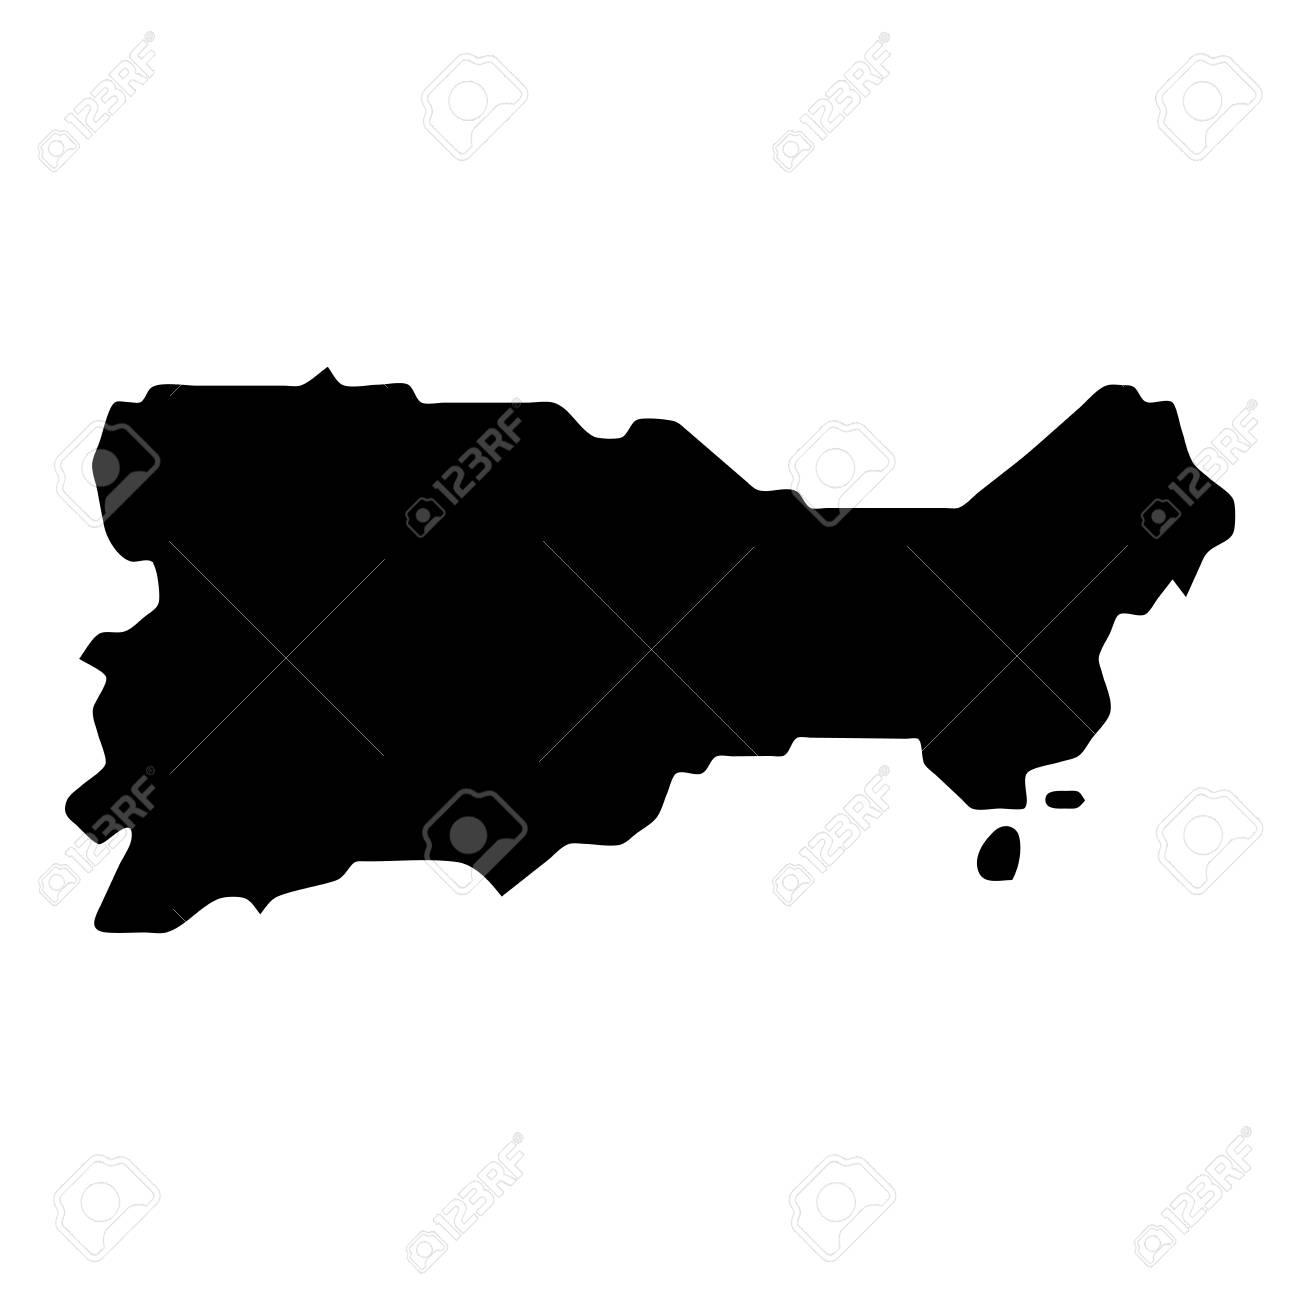 6df5faaa21191 Capri map. Island silhouette icon. Isolated Capri black map outline. Vector  illustration.